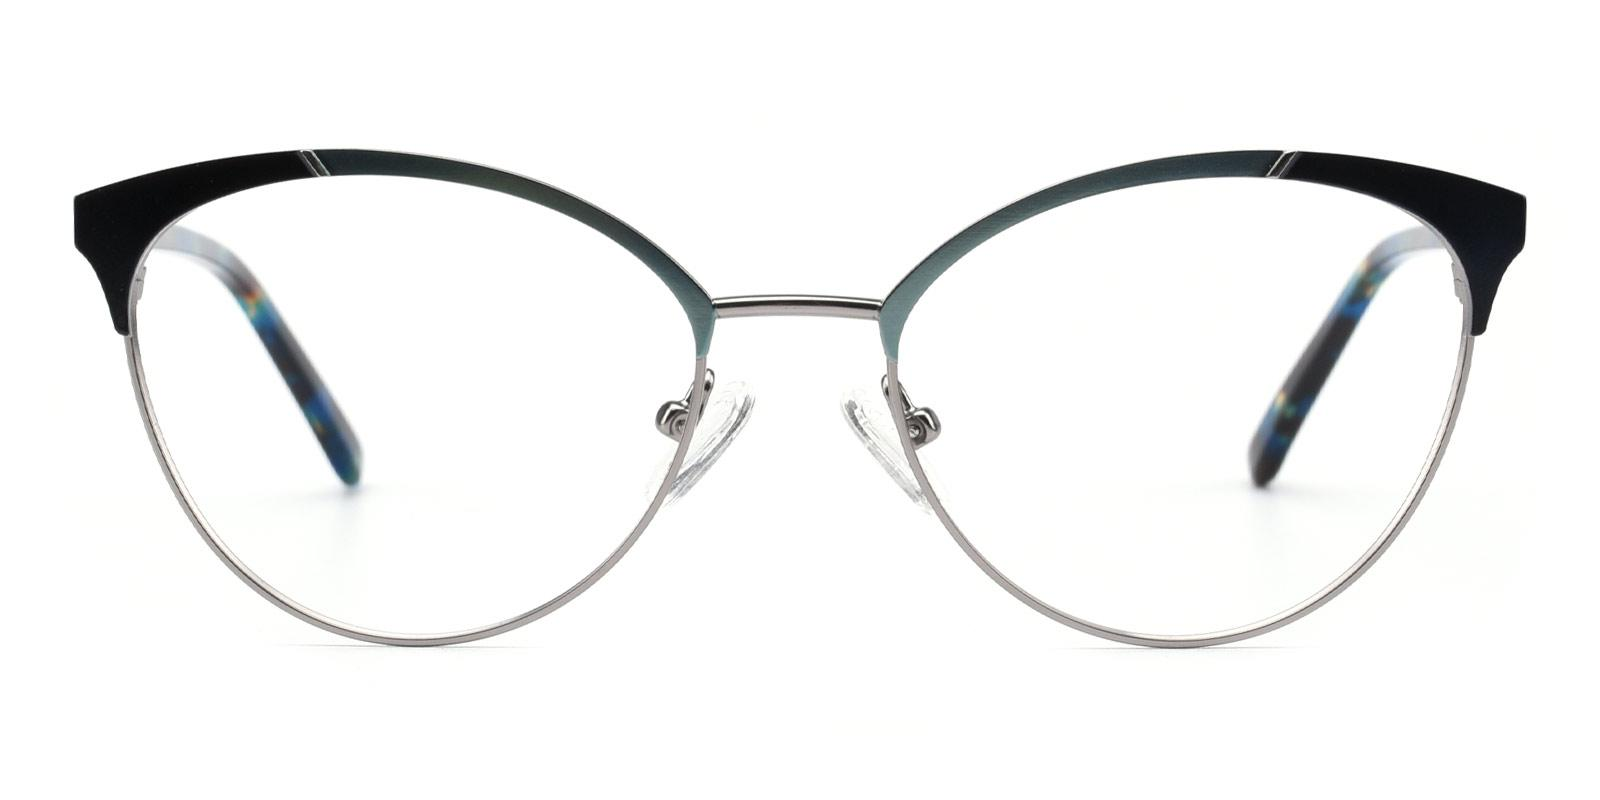 Hobbit-Blue-Cat-Metal-Eyeglasses-detail